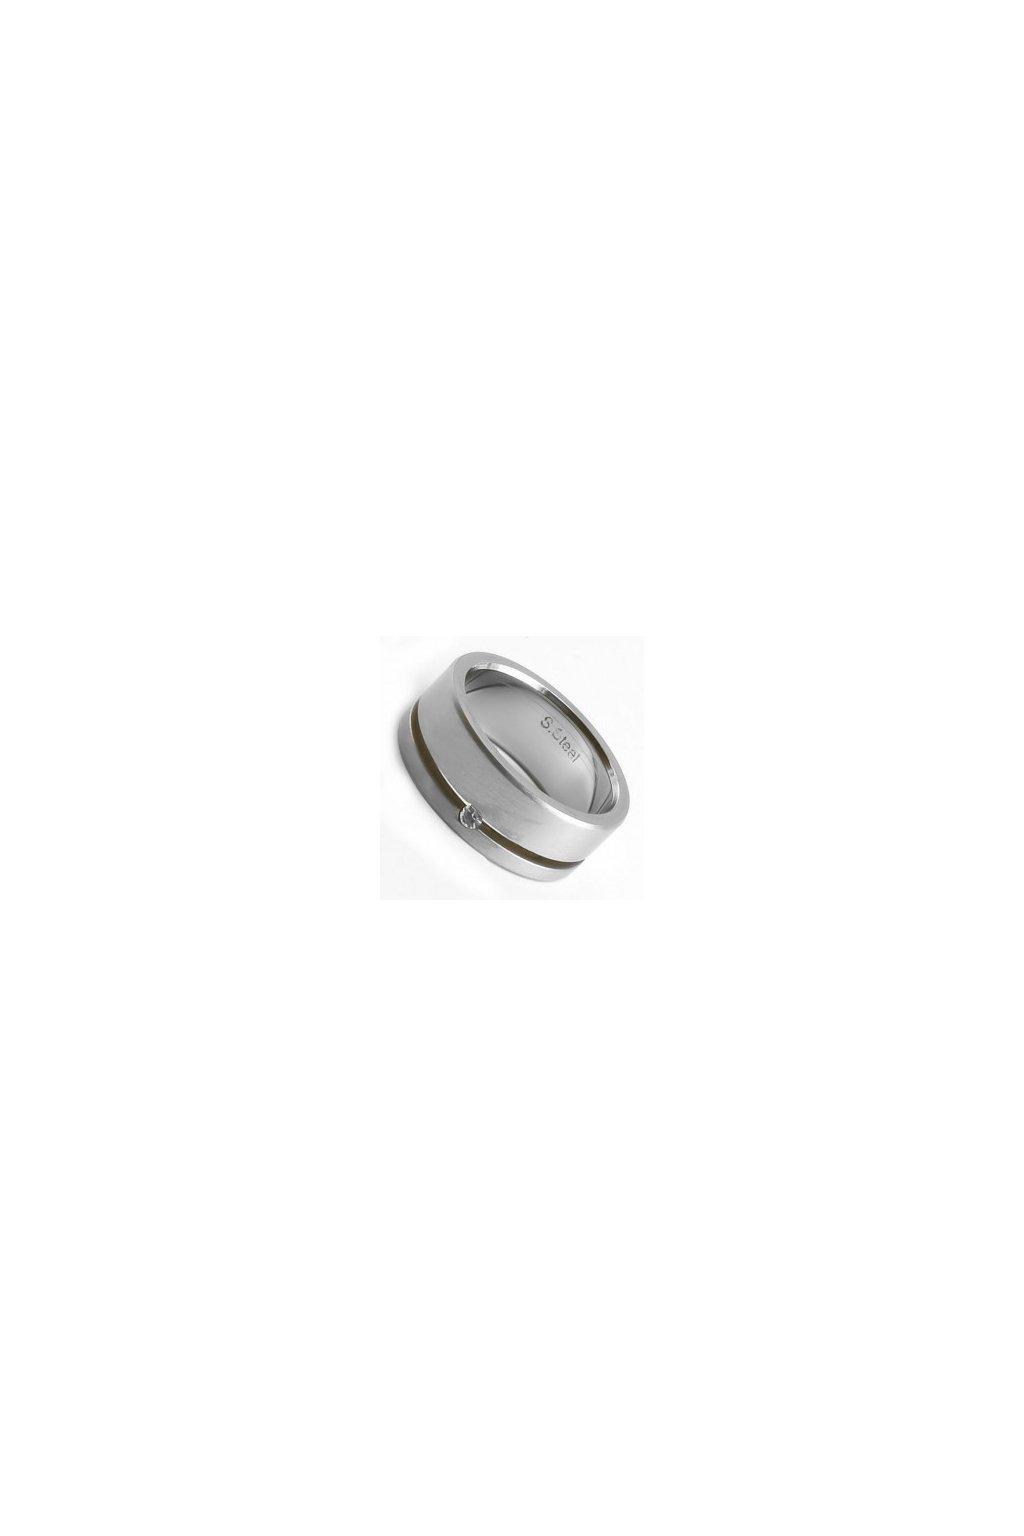 Skalimar Prsten z chirurgické oceli MATNÝ KROUŽEK OSAZEN ČIRÝM ZIRKONEM 212055